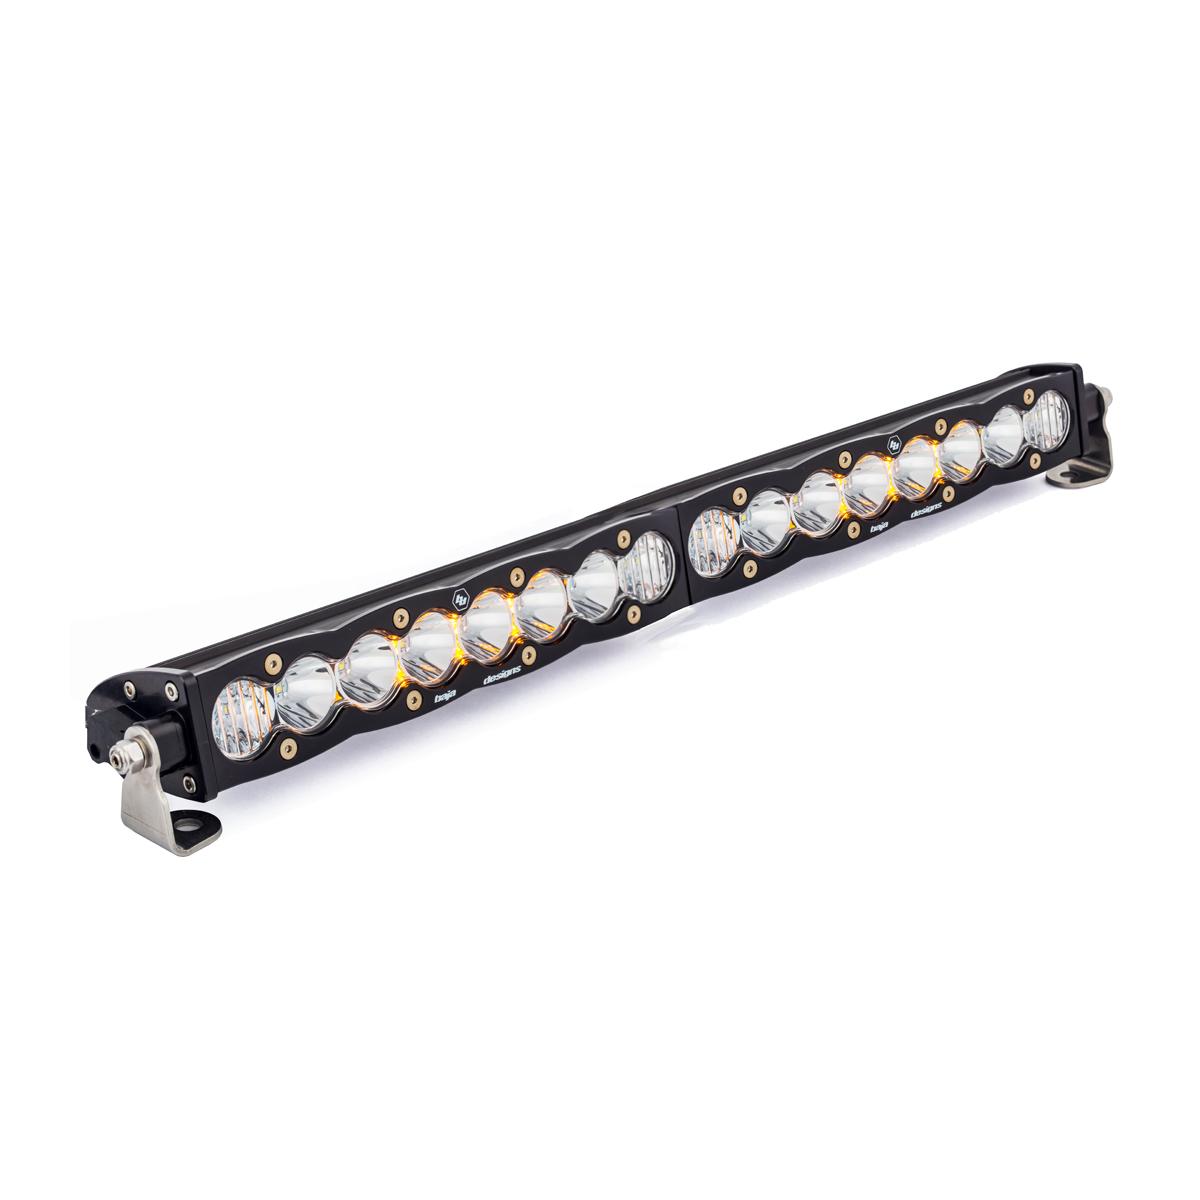 [SCHEMATICS_4UK]  BG_3172] Wiring Diagram For Dual Led Light Bars Free Download Schematic  Wiring | Wiring Diagram For Dual Led Light Bars Free Download |  | Kumb Aspi Bocep Mohammedshrine Librar Wiring 101